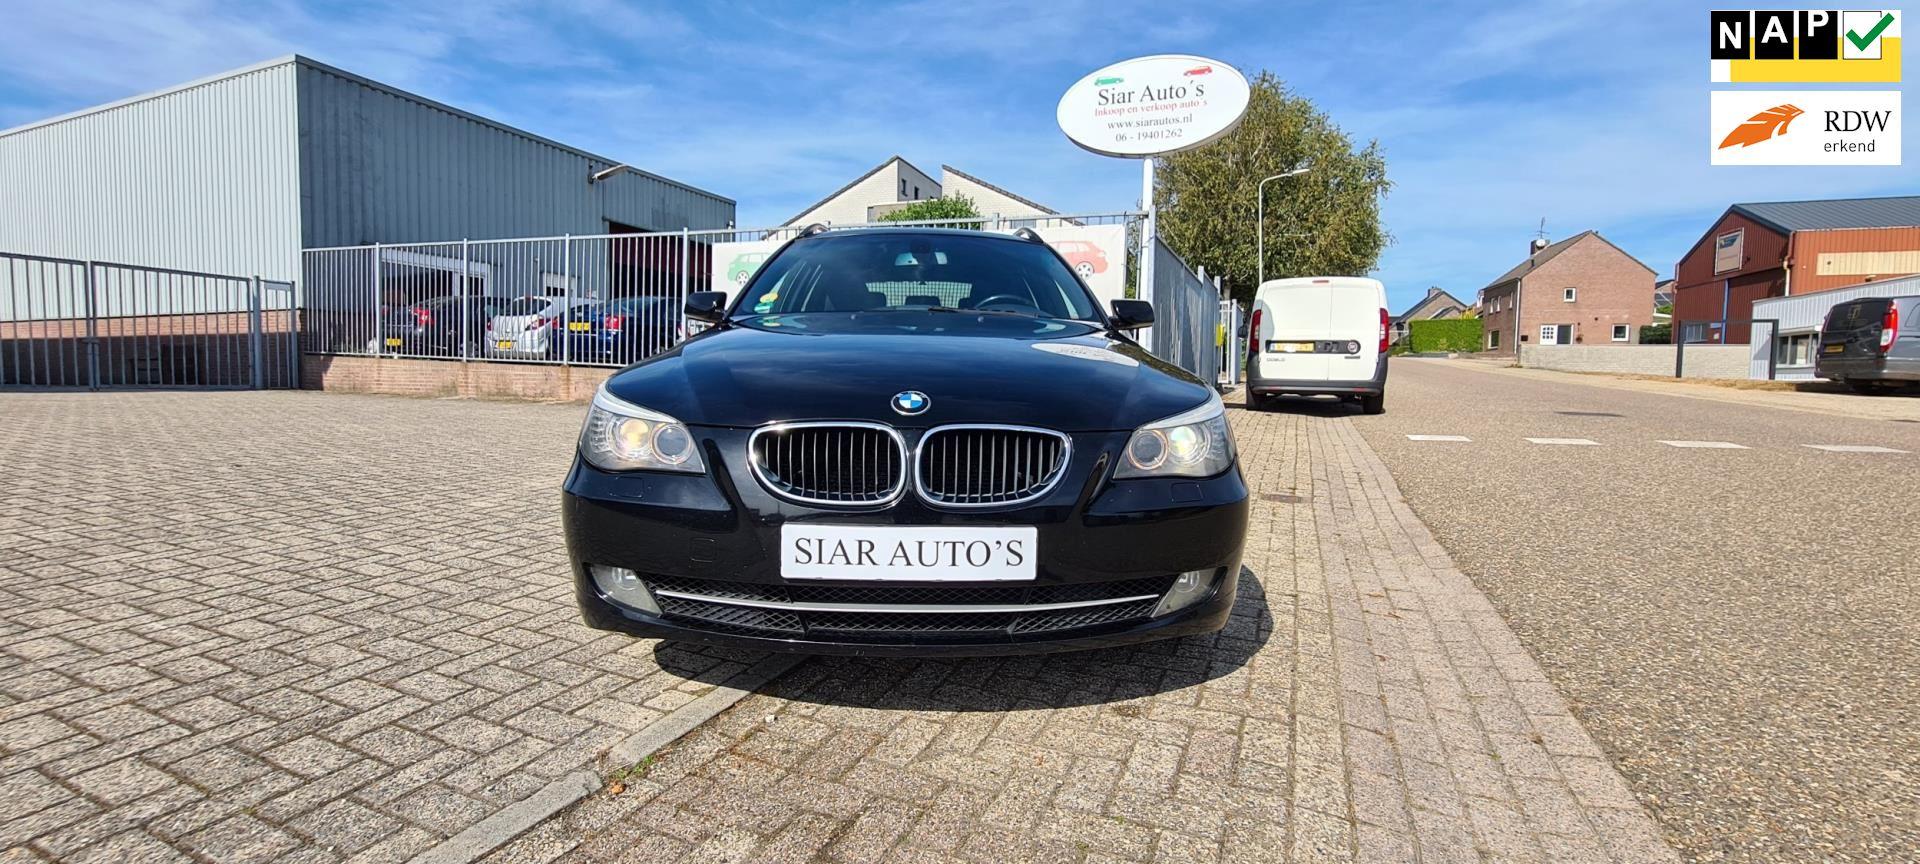 BMW 5-serie Touring occasion - Siar Auto's